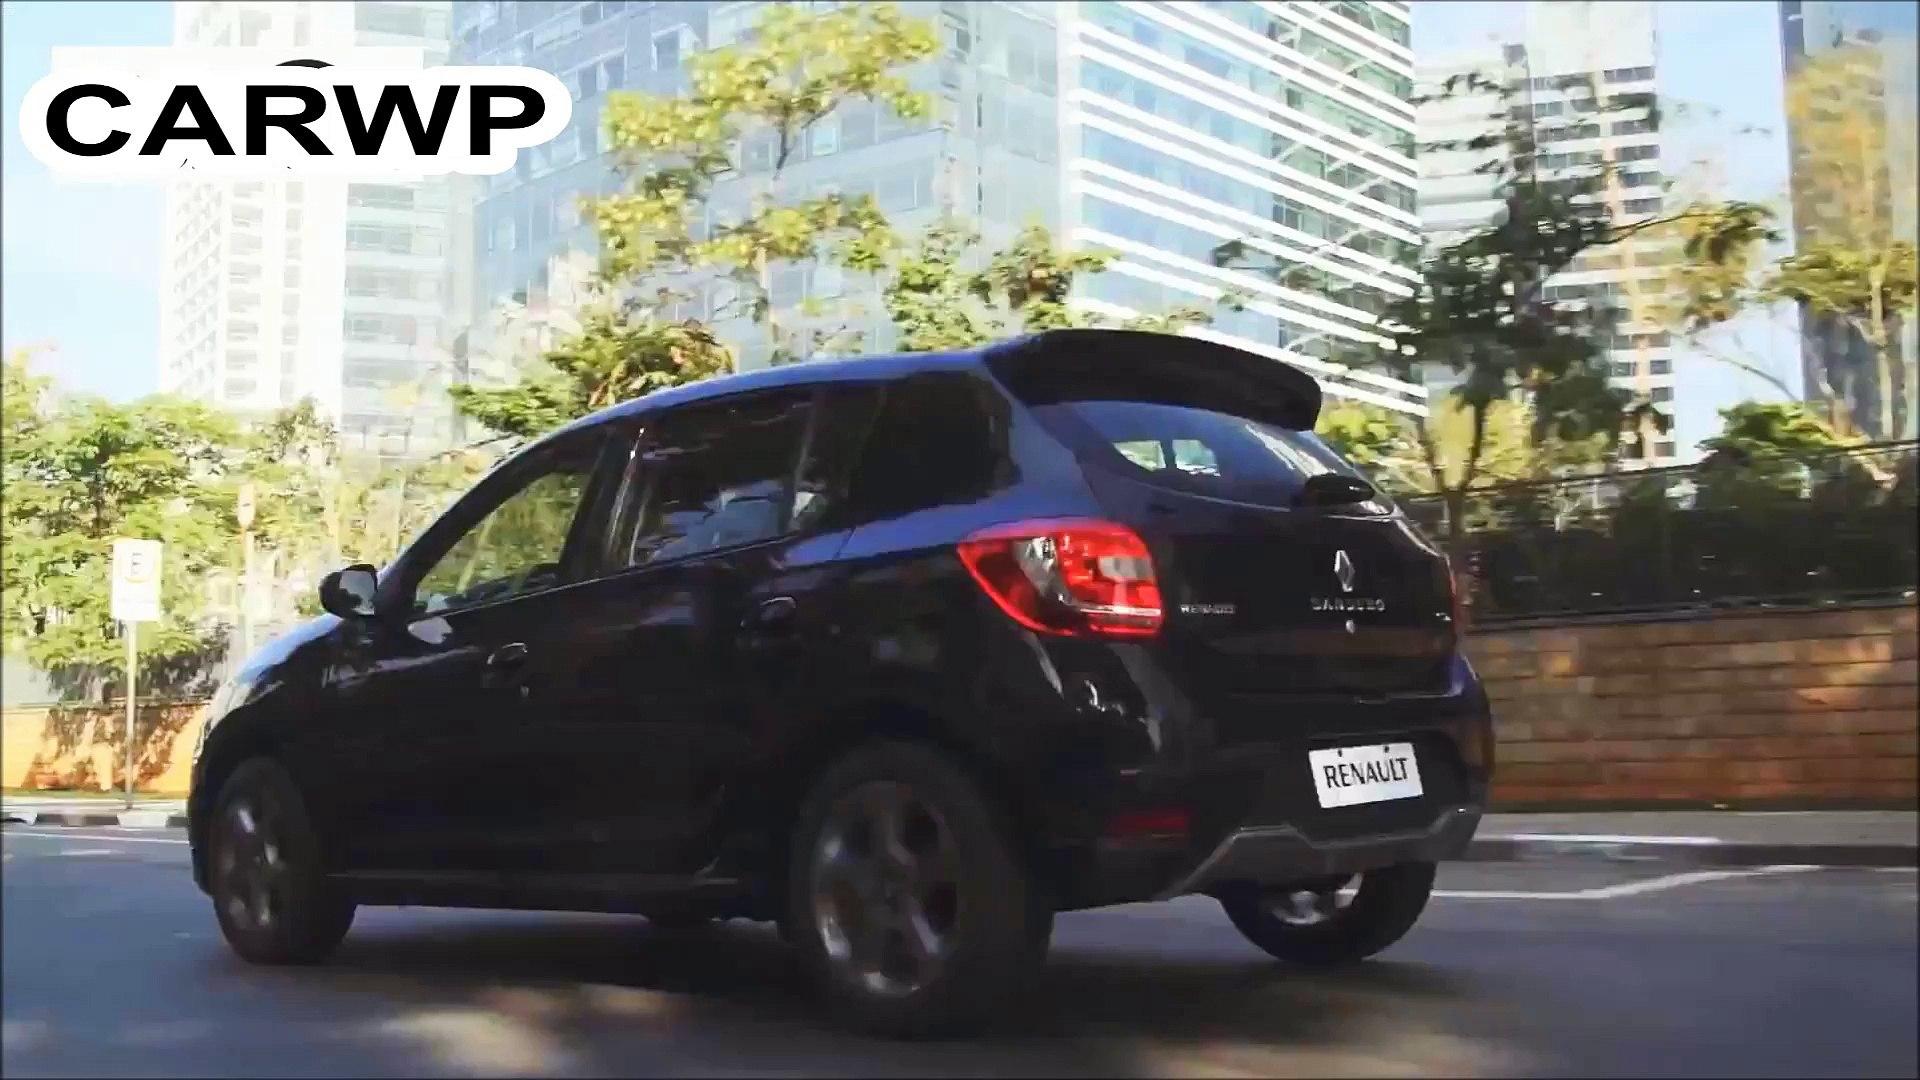 DESIGN R$ 48.990 Renault Sandero GT Line 2016 aro 16 1.6 8v Hi-Power 106 cv 15,5 mkgf @ 60 FPS